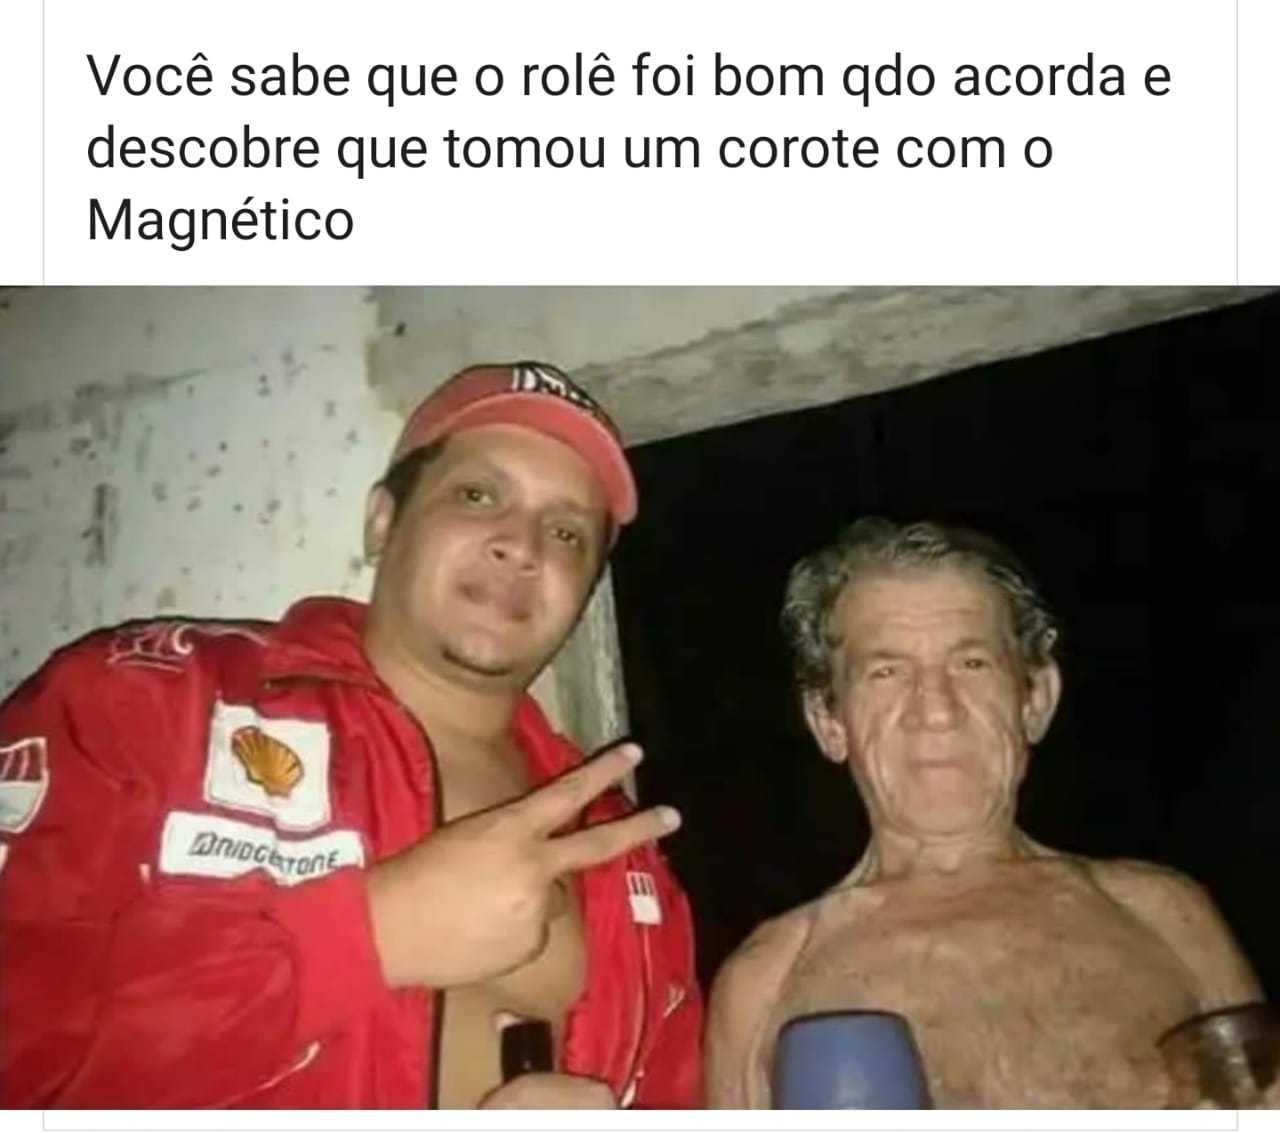 Magnético - meme